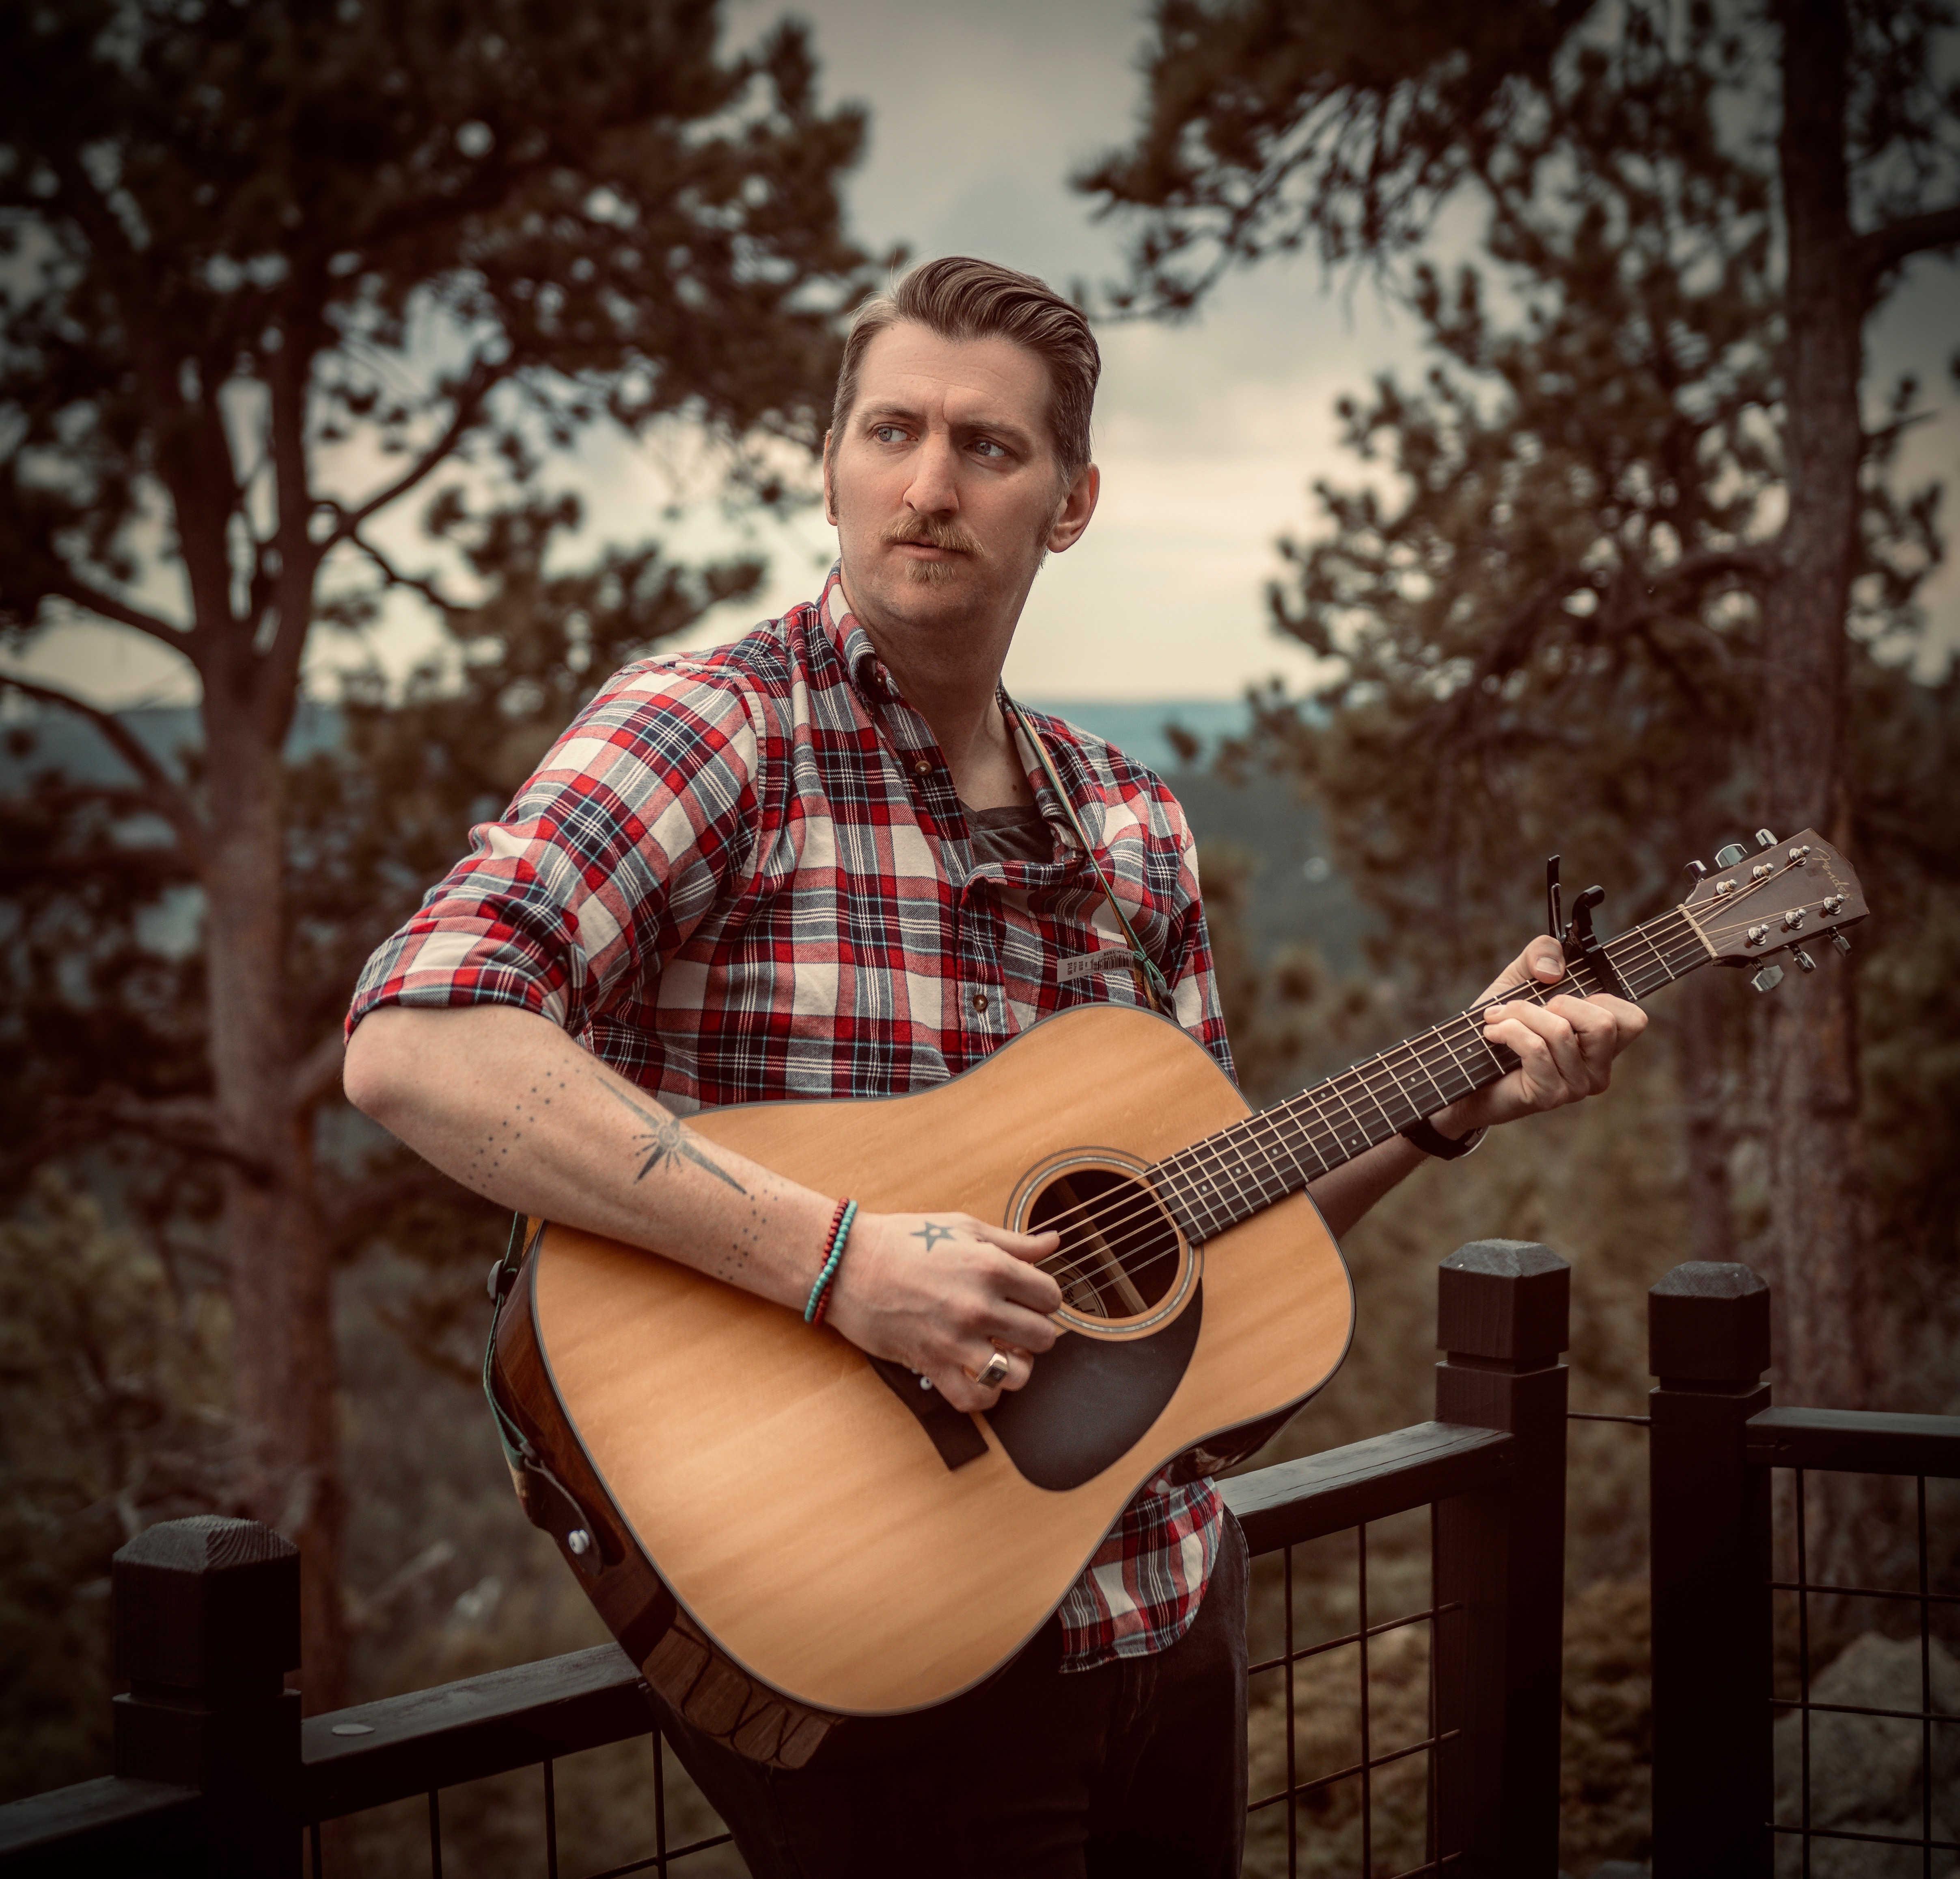 Joshua Bucy holding guitar